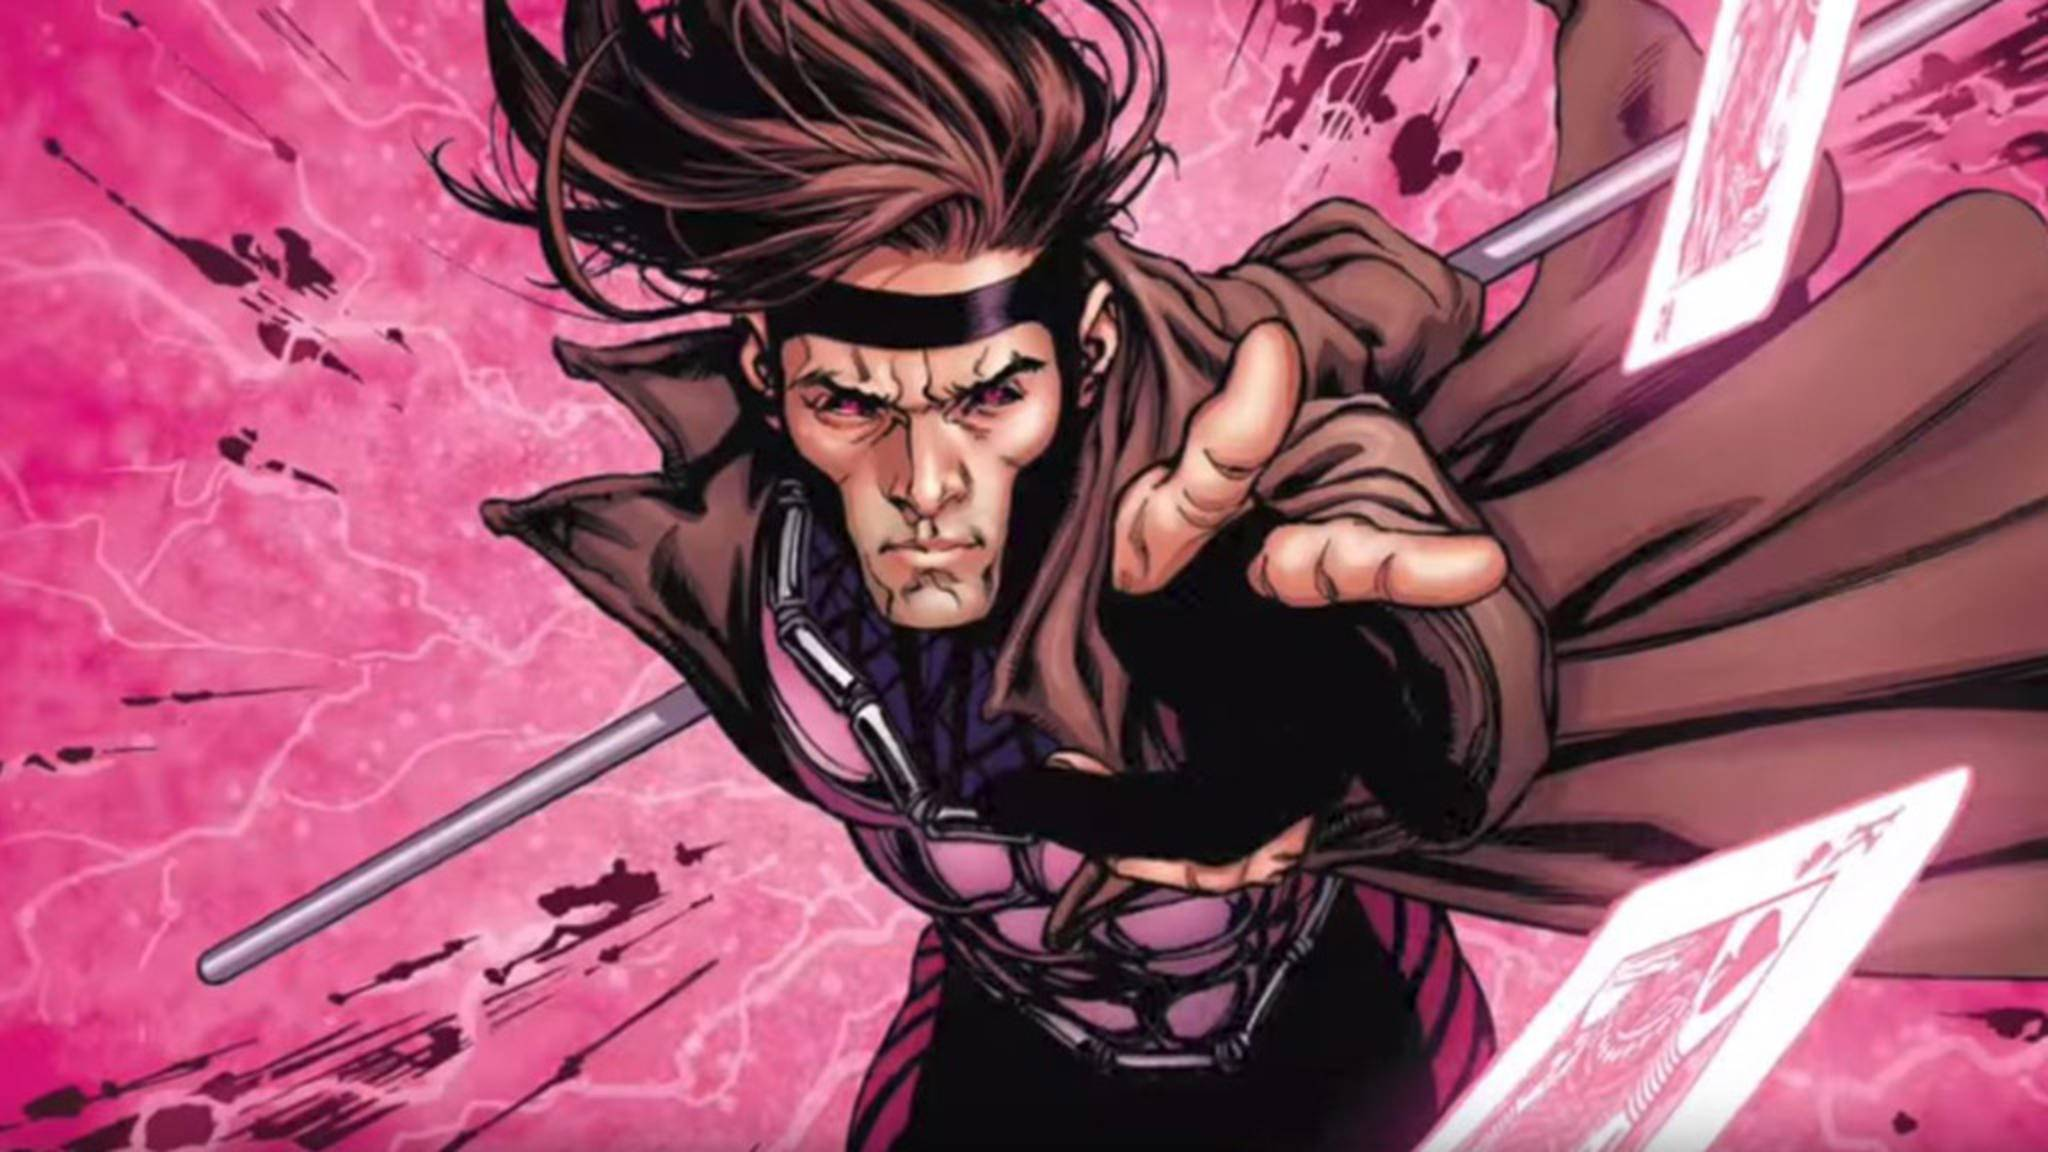 Die Karten stehen gut, dass Gambit Anfang 2019 die große Leinwand erobert.